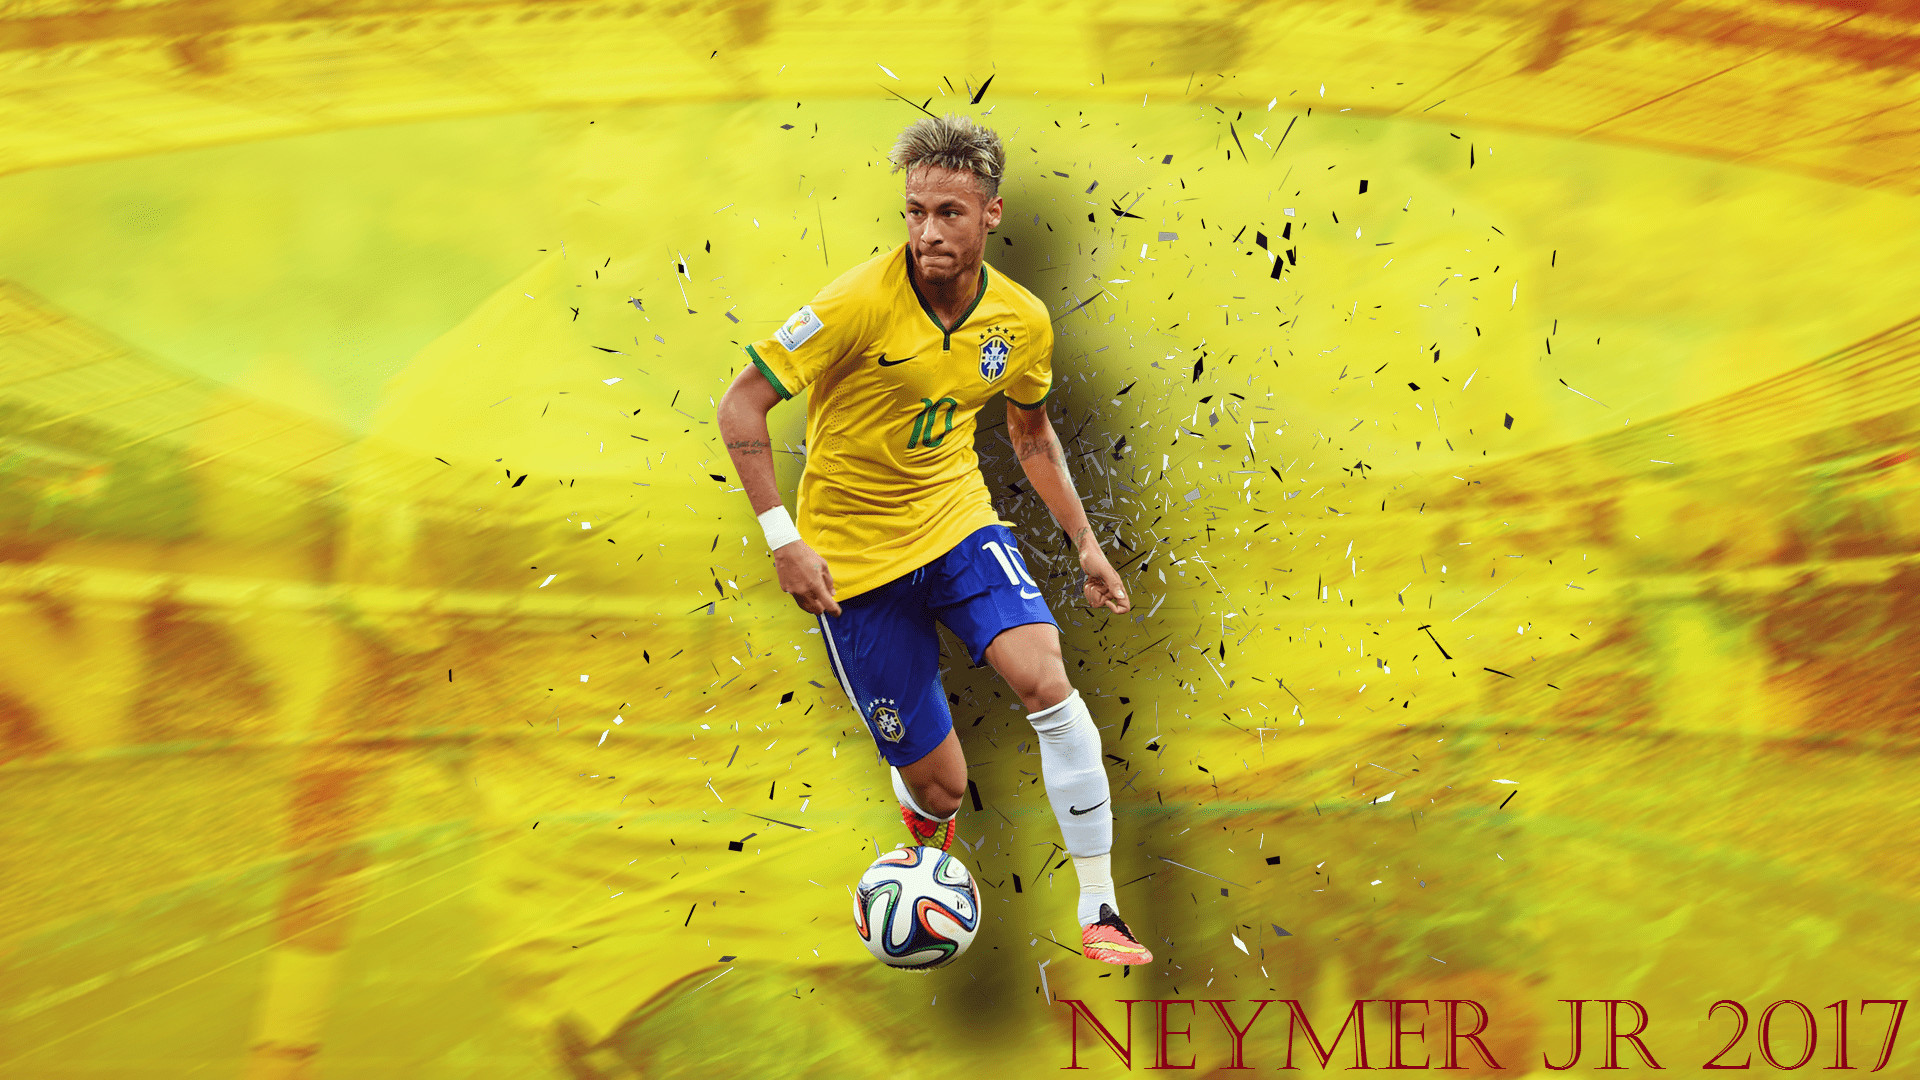 Neymar Wallpaper 2017 Hd Wallpapertag